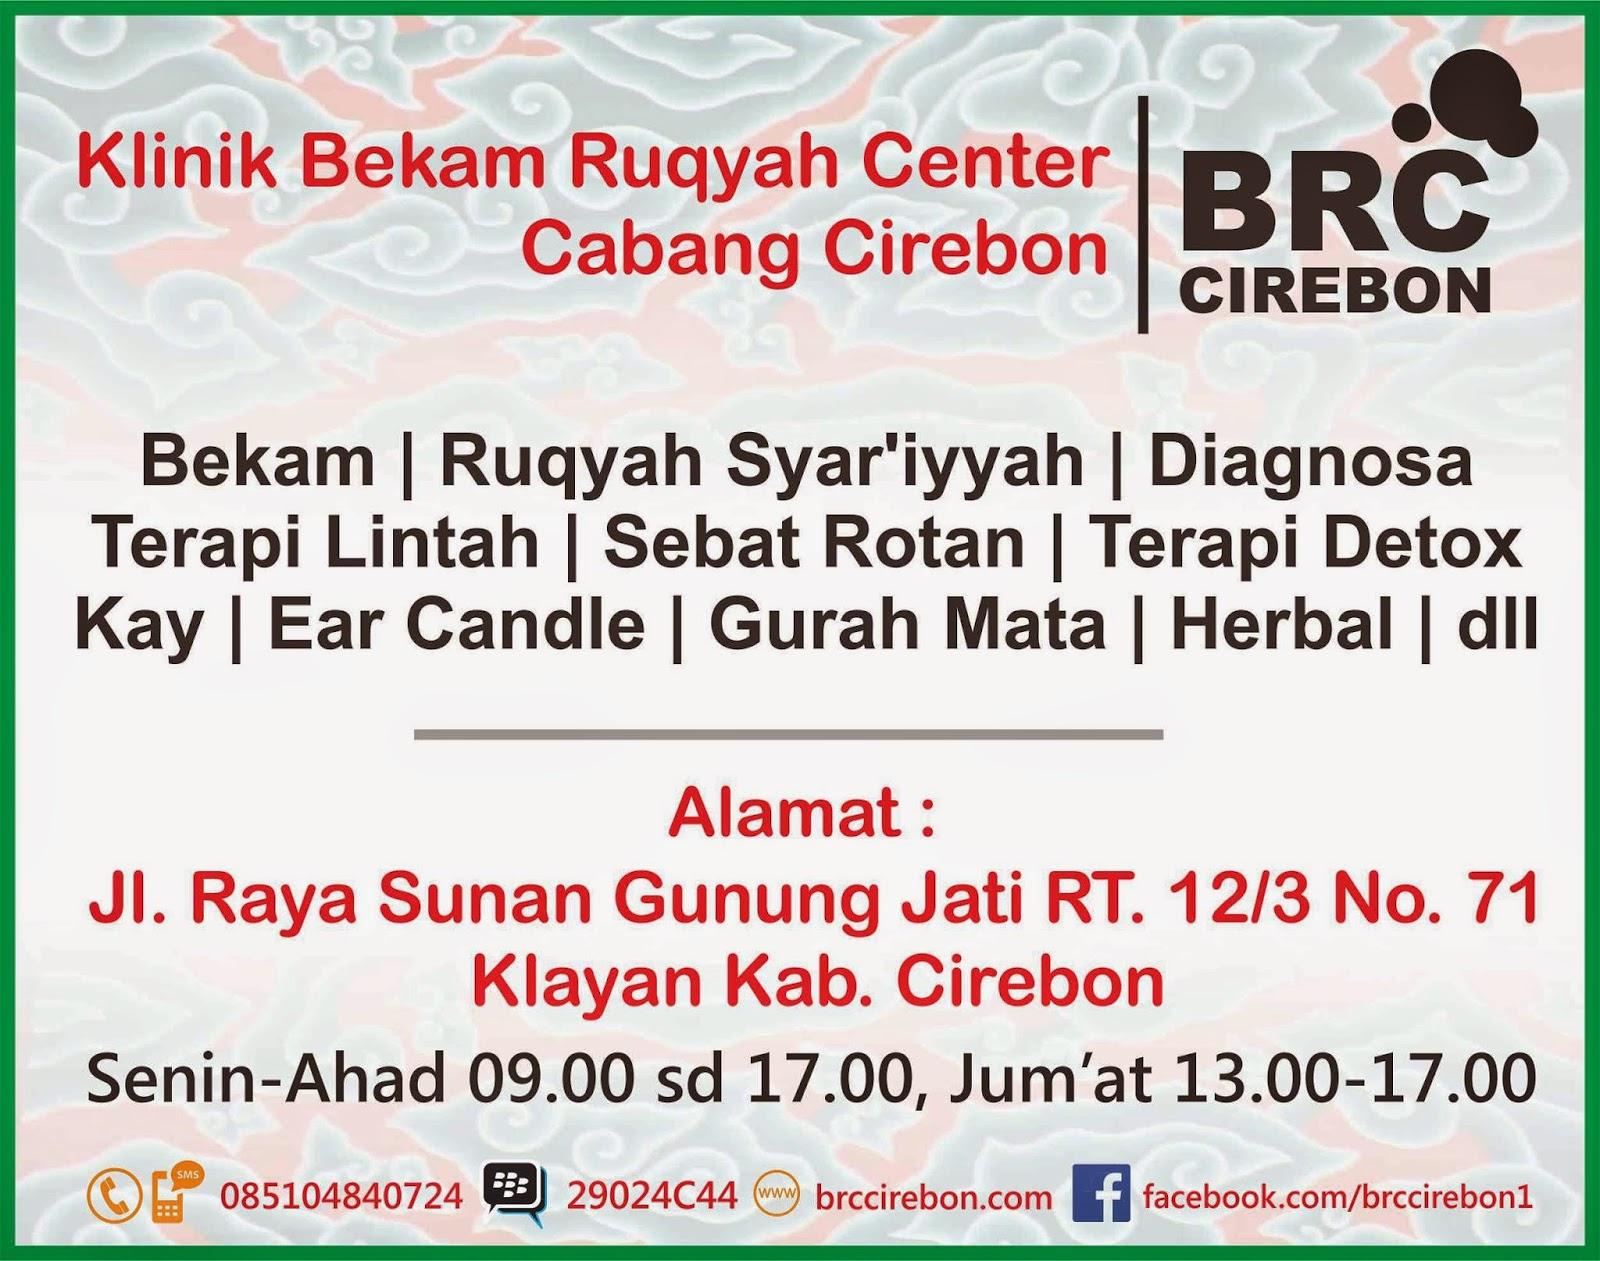 Kontak Klinik Bekam Ruqyah Syar'yyah di Cirebon